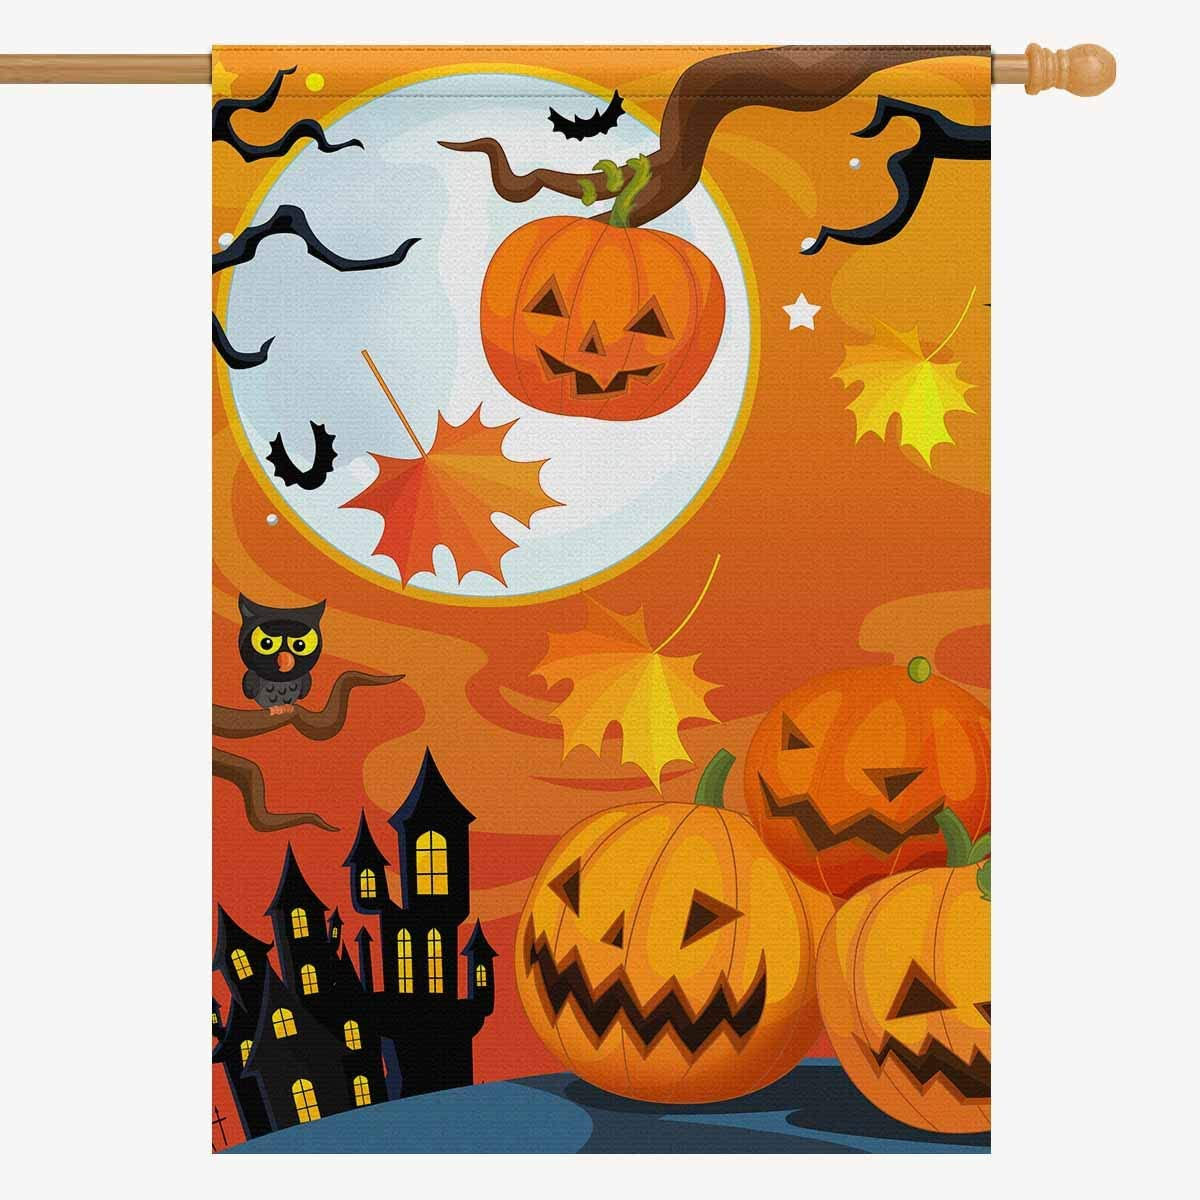 Halloween Pumpkin Garden Flag Banner Decorative Flags Outdoor Yard Lawn Decor